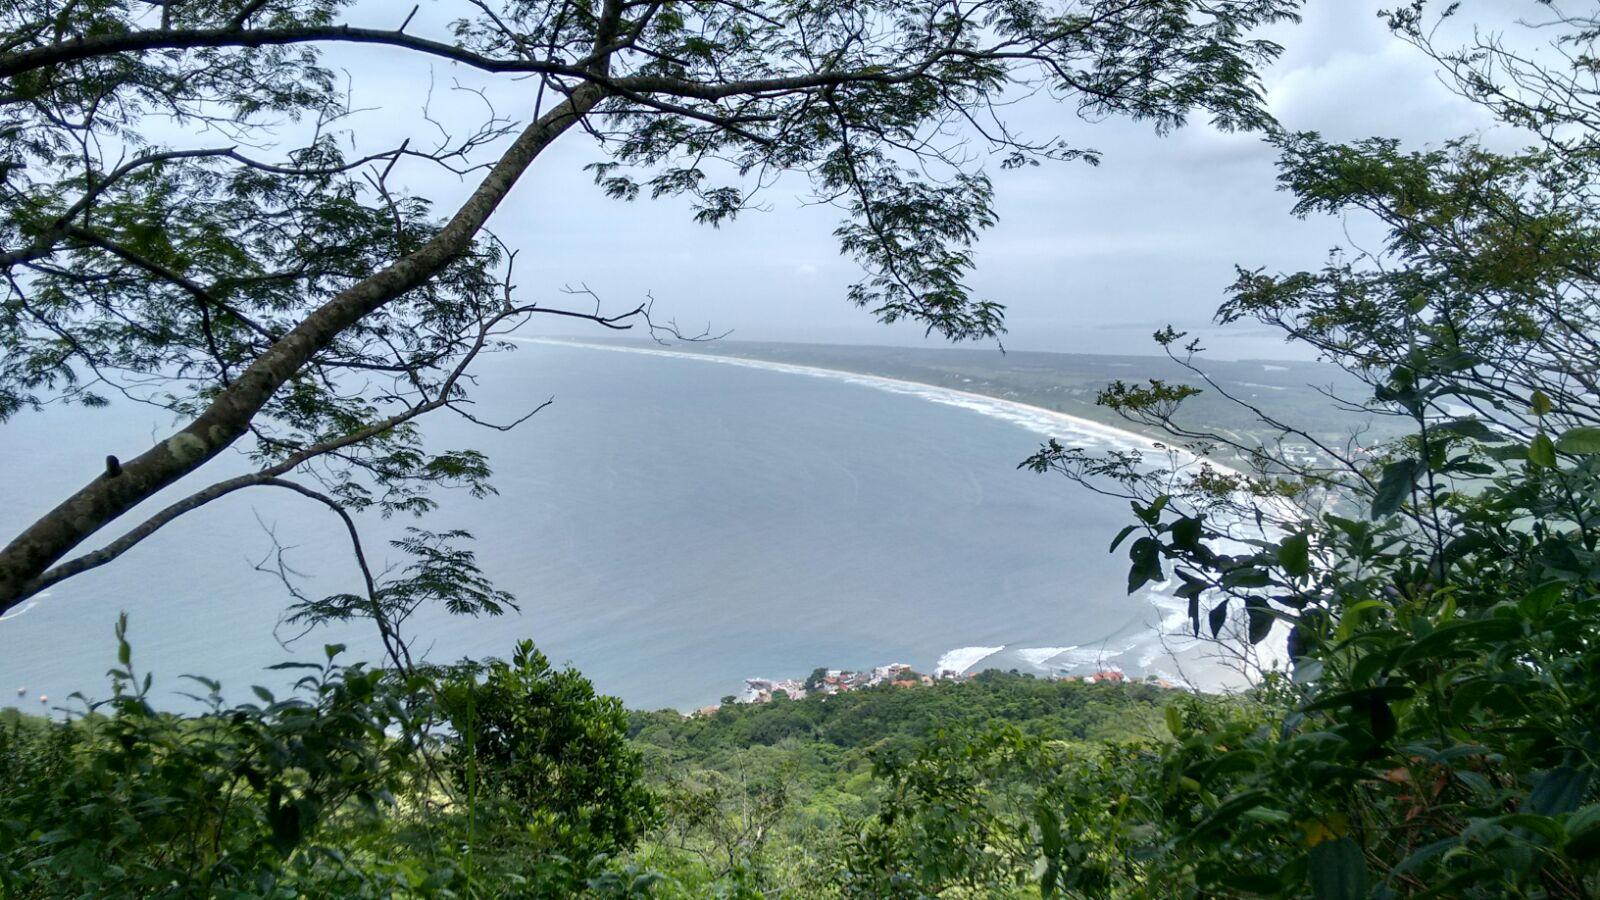 Vista da Barra de Guaratiba